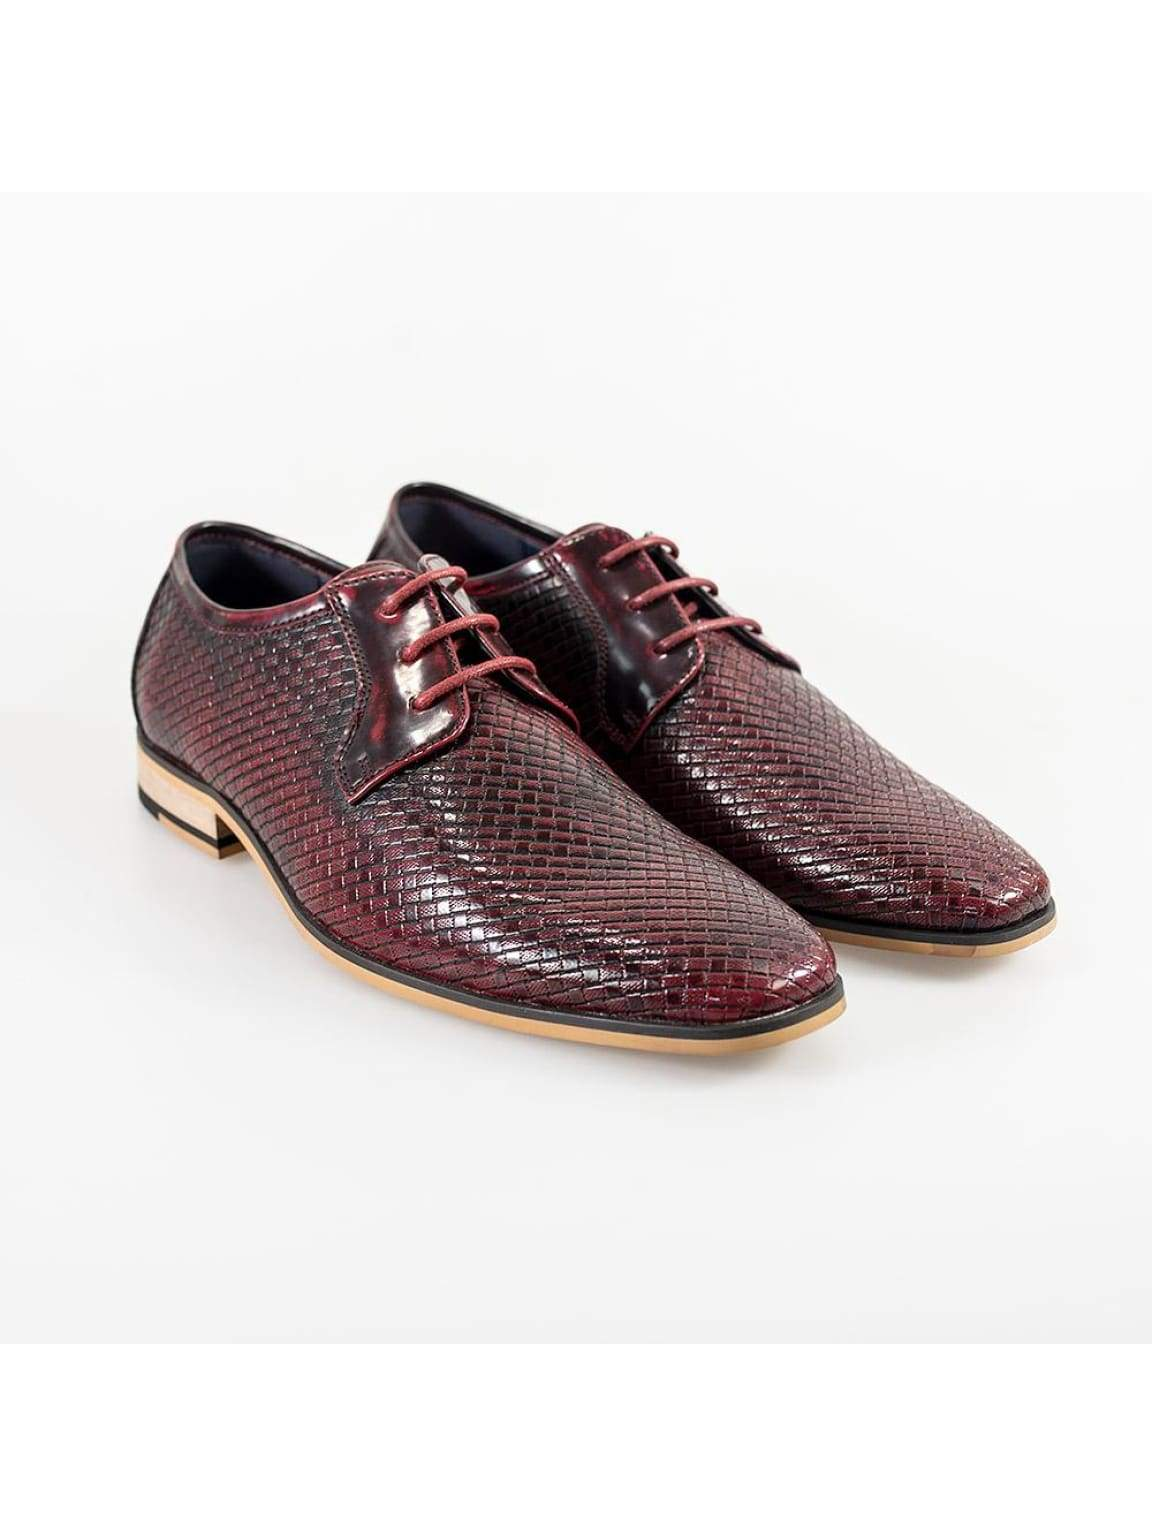 Cavani Rex Burgundy Formal Shoe - UK7 | EU41 - Shoes